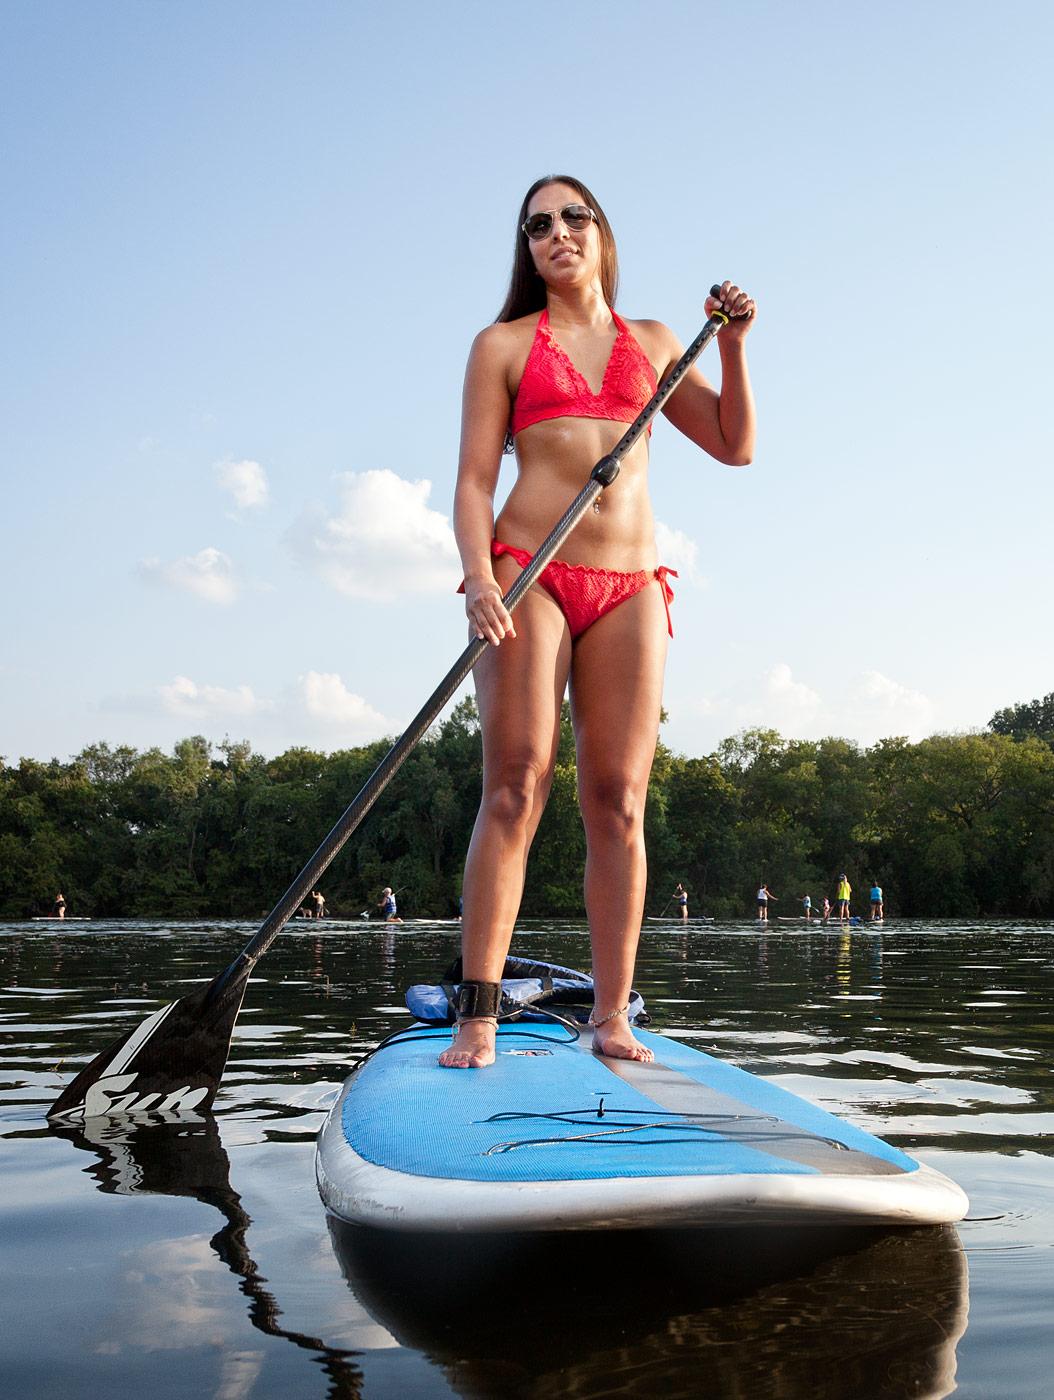 Adventure-ABP-Liz-paddleboard1.jpg